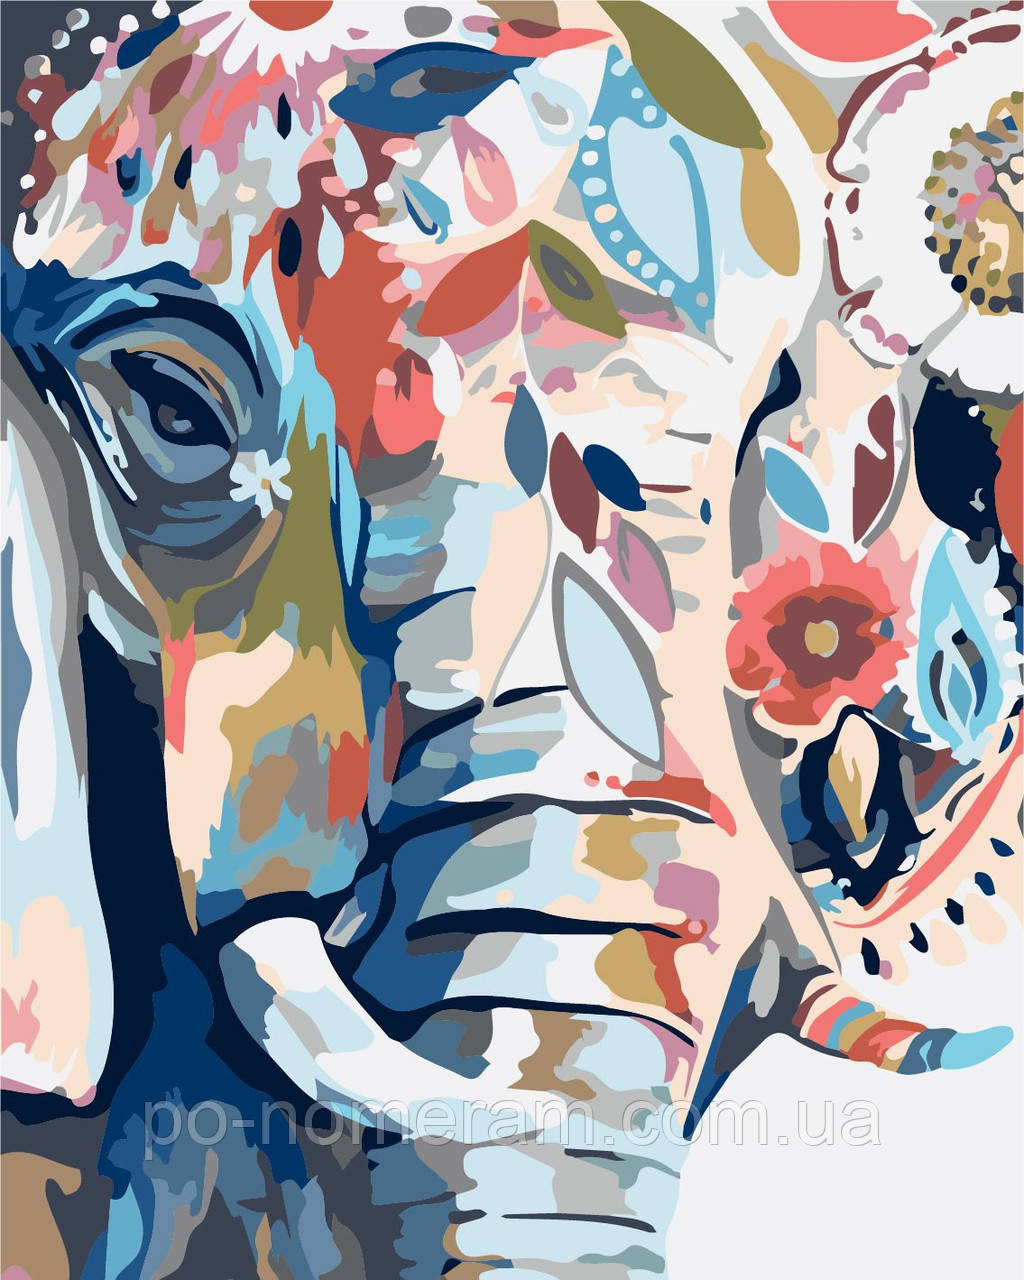 Картина по номерам Идейка Восточные краски (KH2470) 40 х 50 см - Картины по номерам, раскраски по цифрам в Киеве